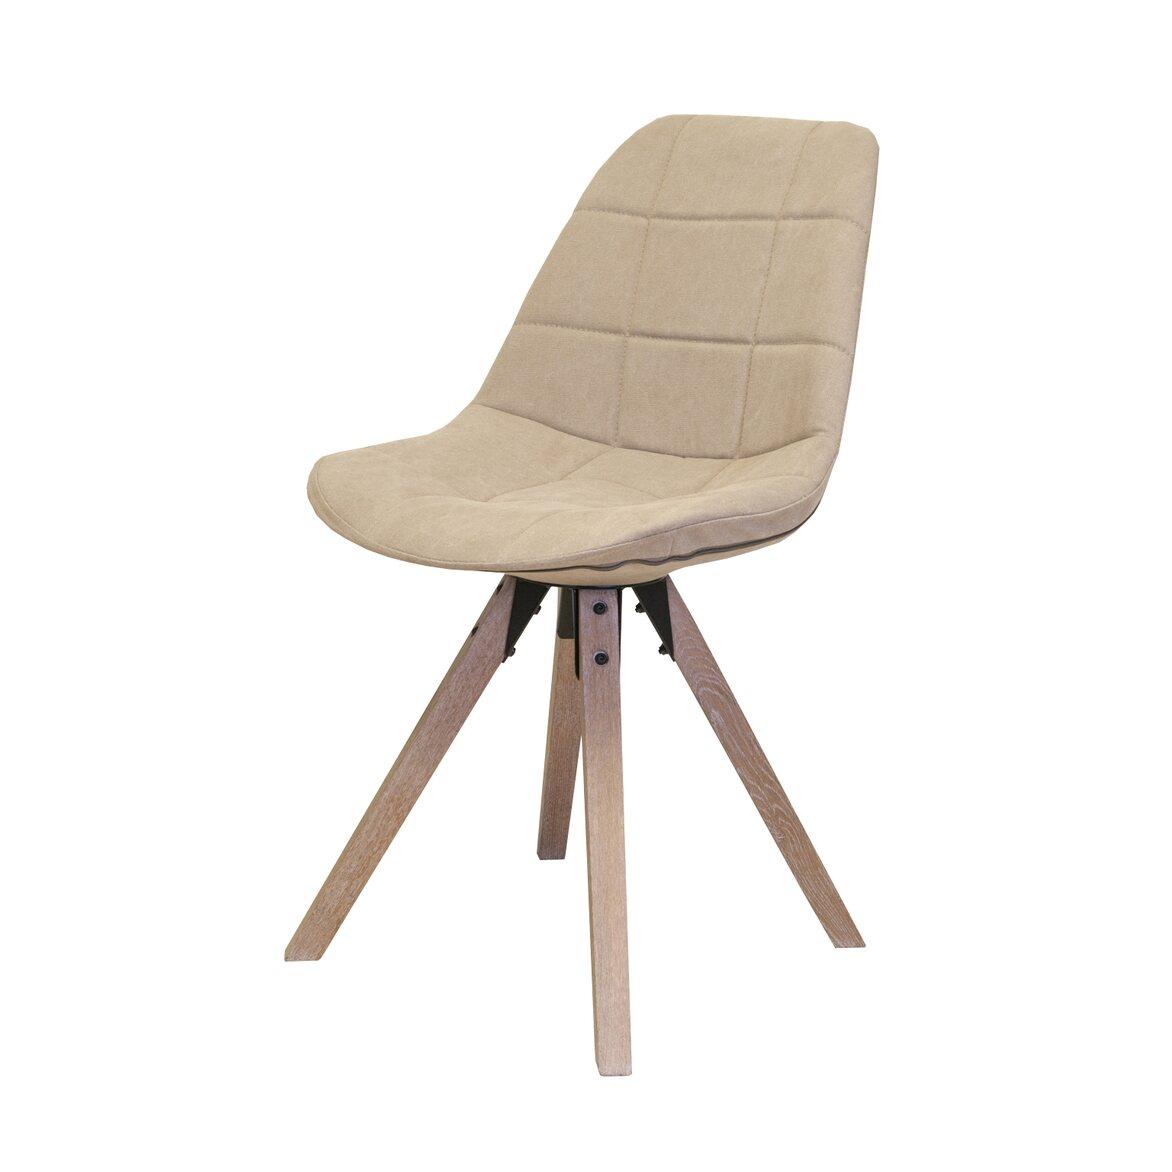 Стул Dax 4 | Обеденные стулья Kingsby